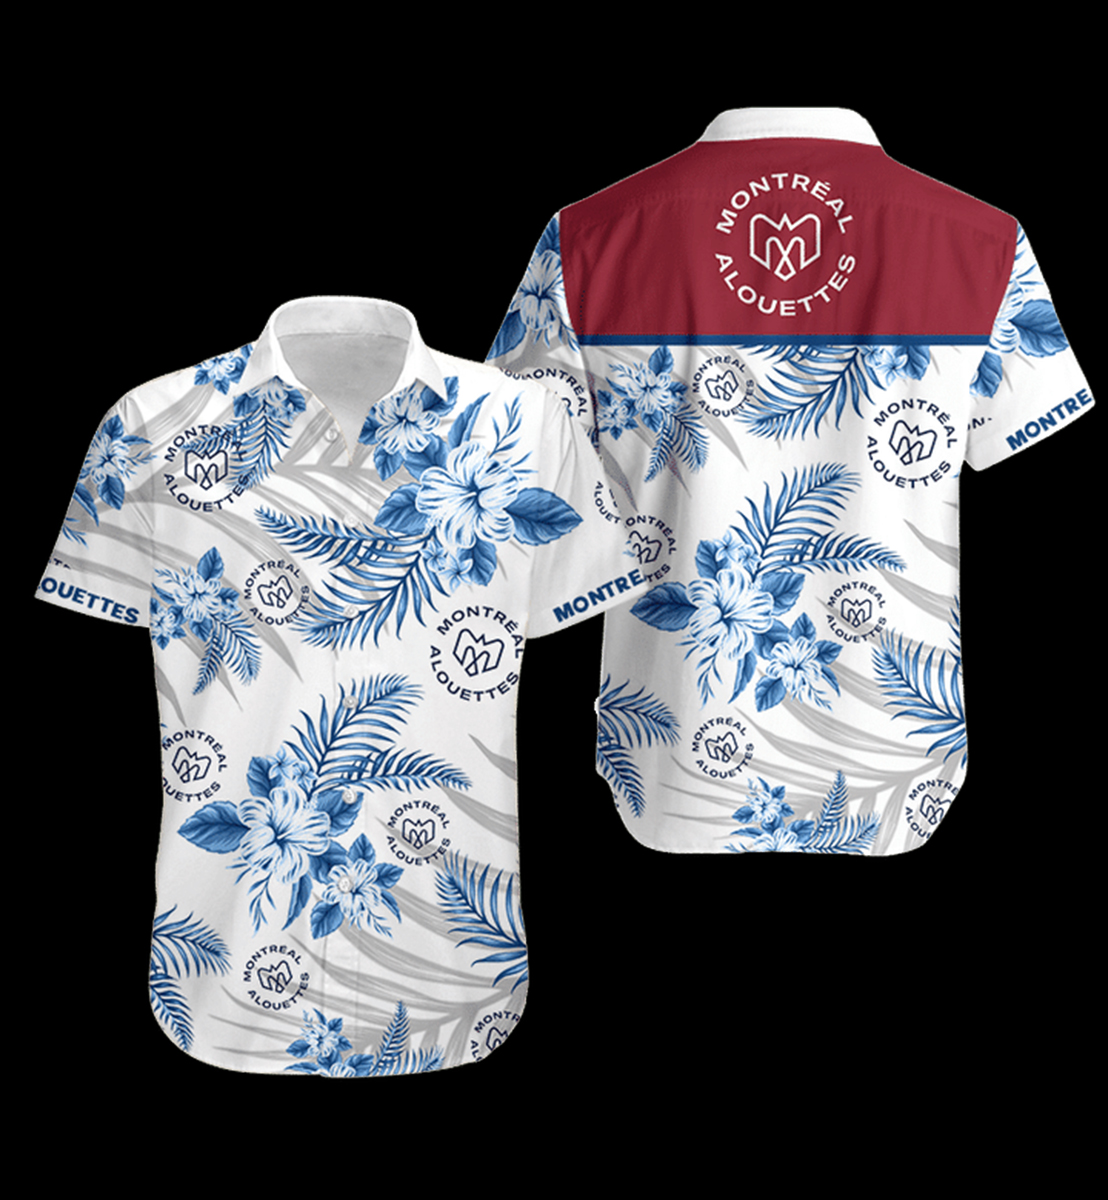 3 Montreal Alouettes Hawaiian Shirt 1 1